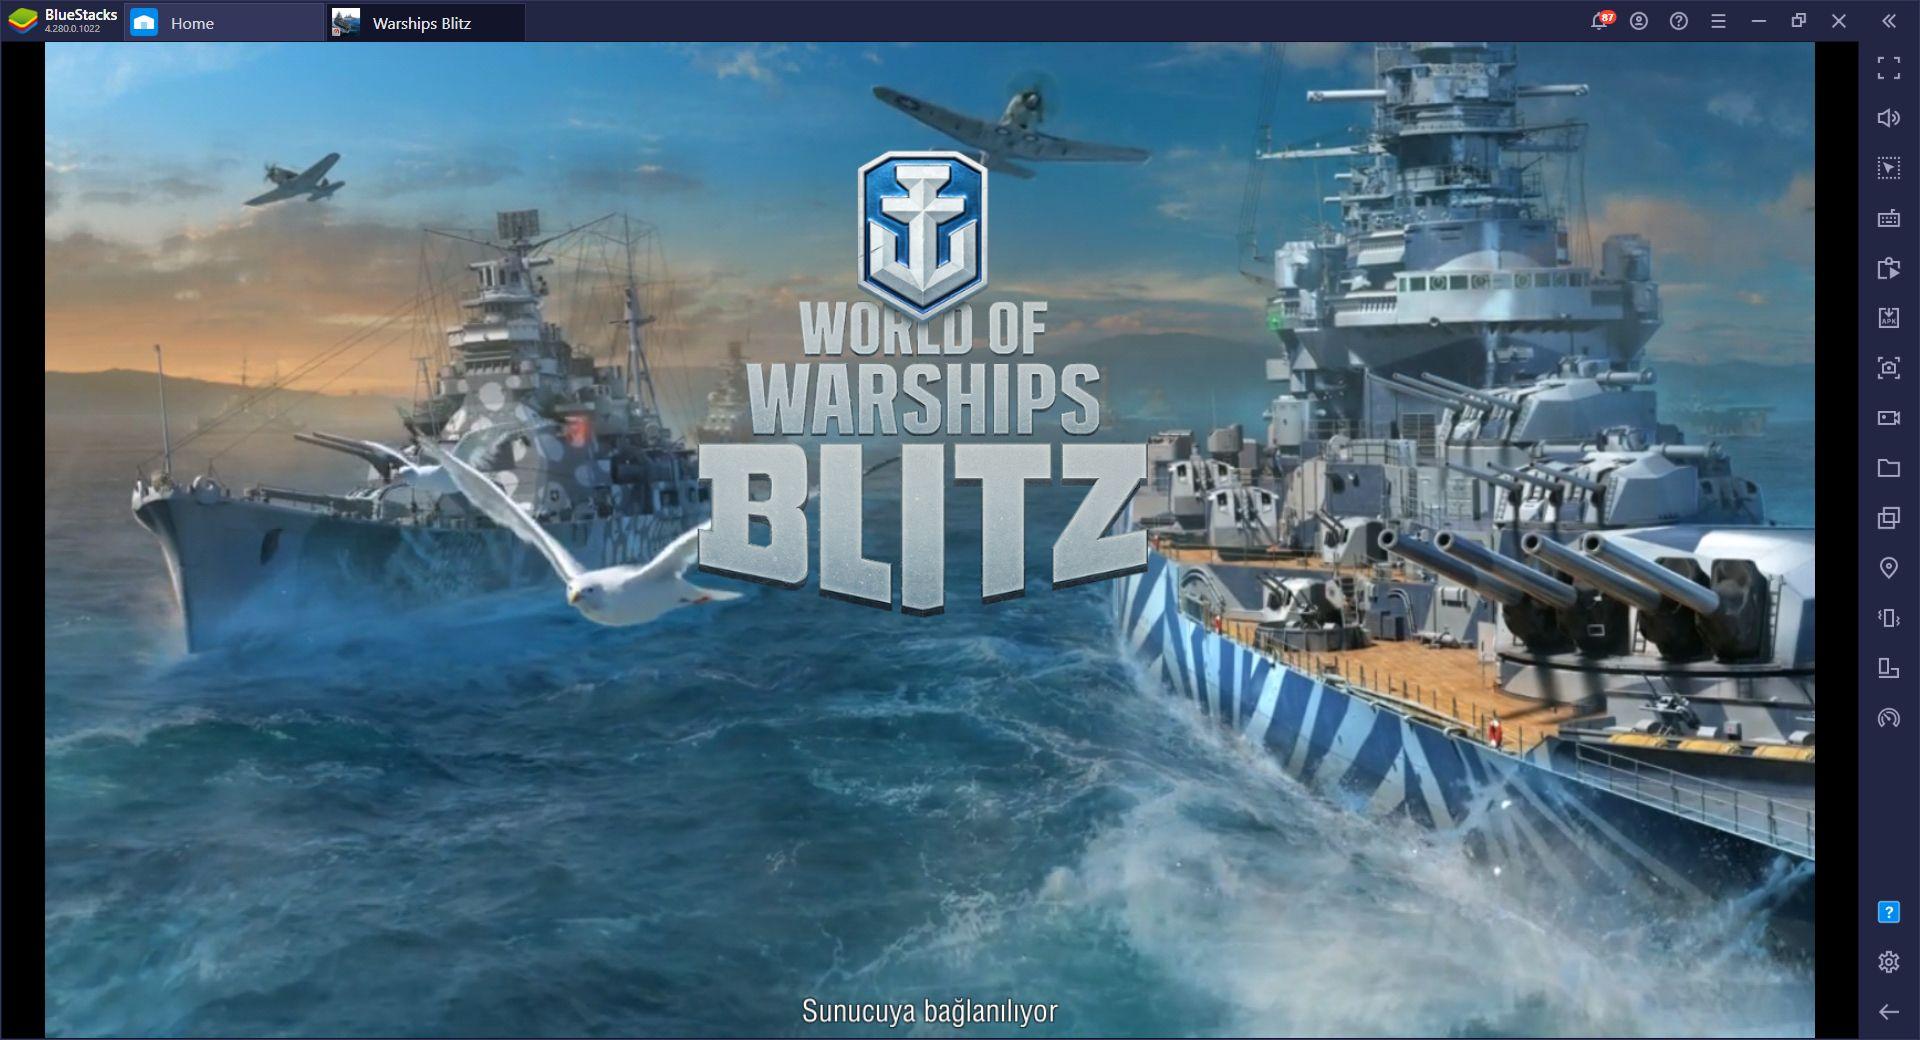 BlueStacks ile World of Warships Oynayın